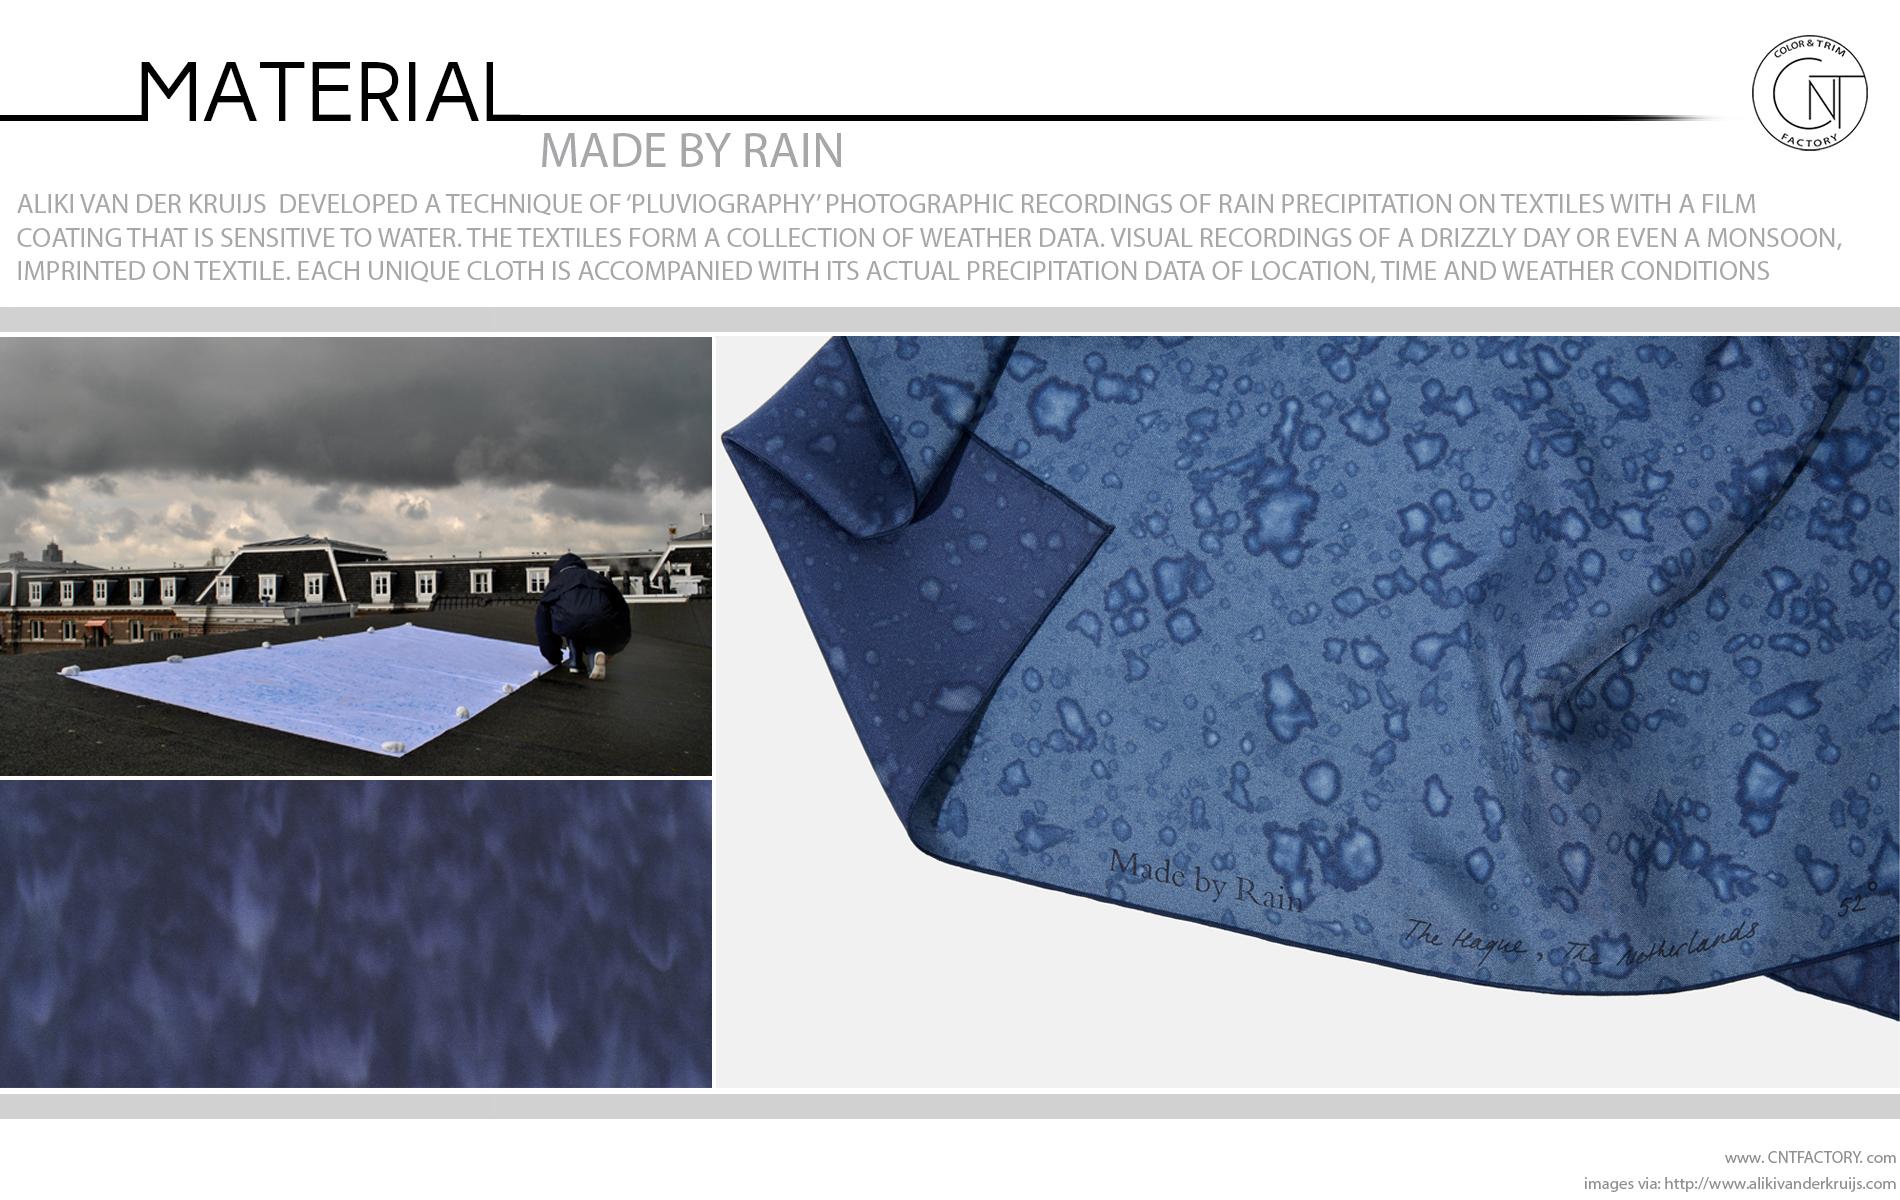 Rain made Photographic Recordings Rain